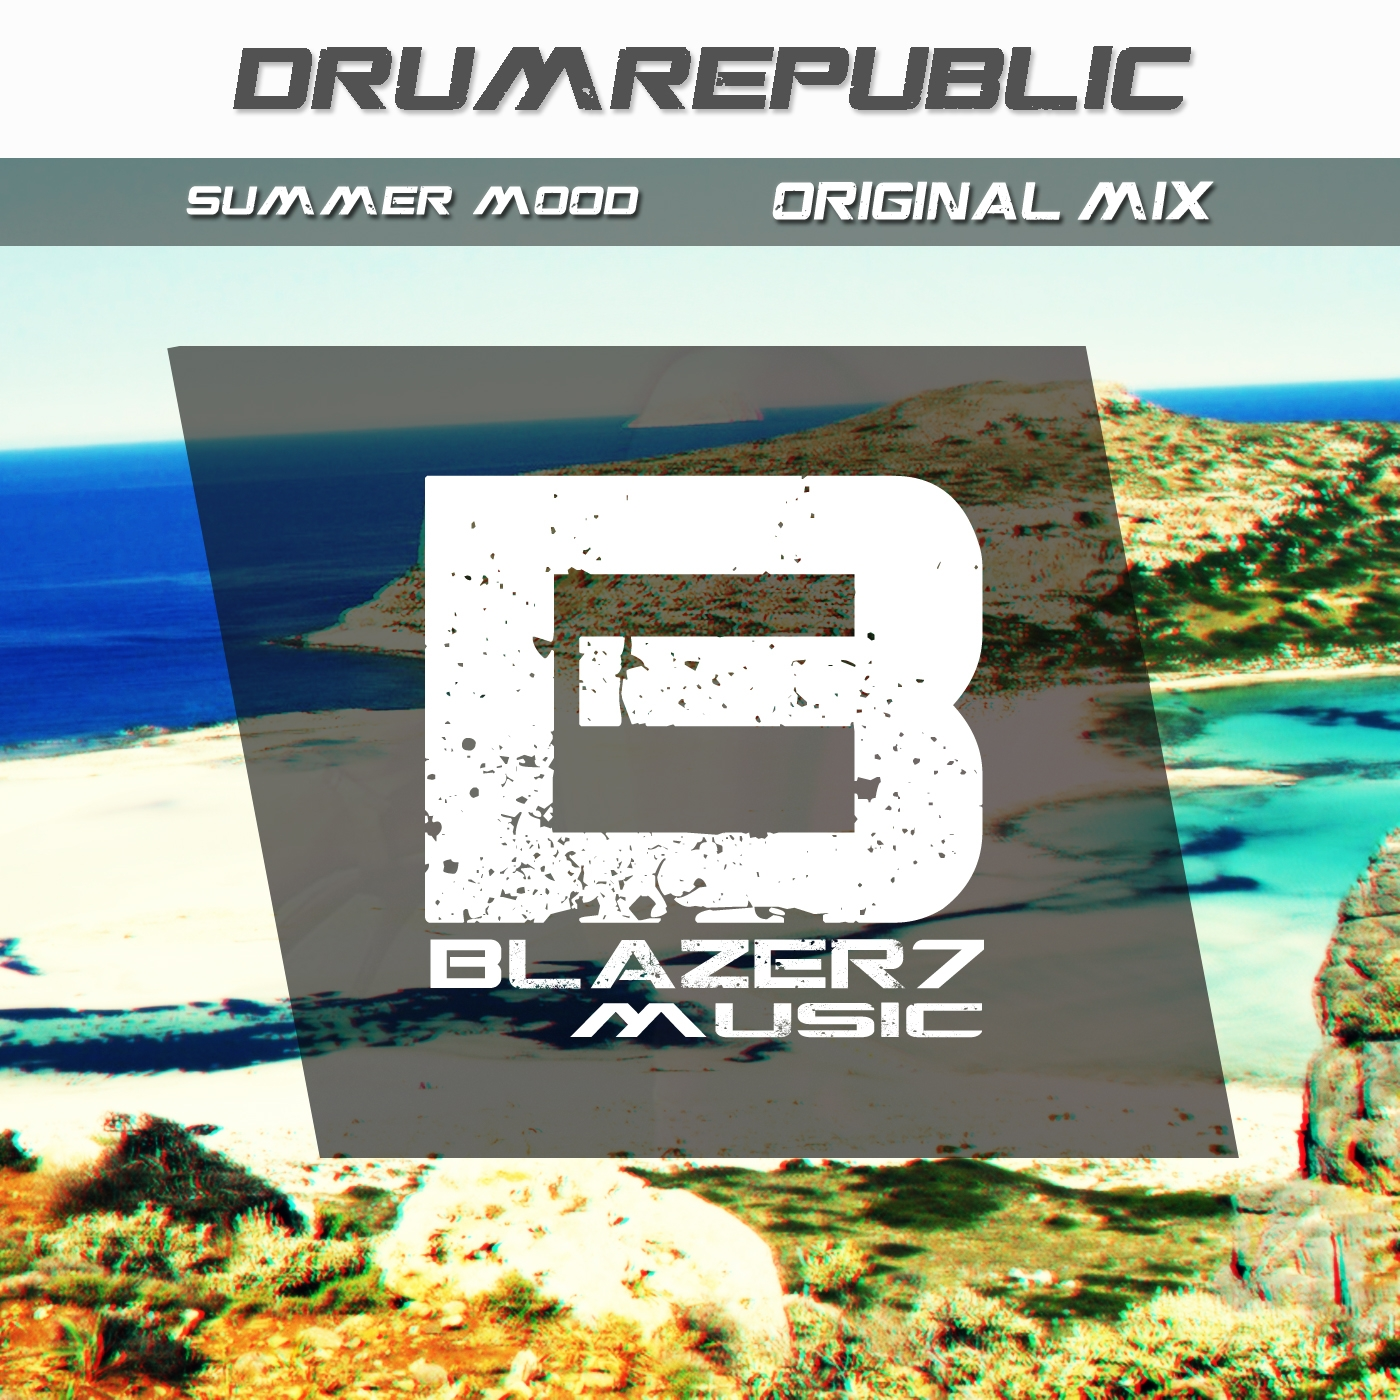 Drumrepublic - Summer Mood (Original Mix)